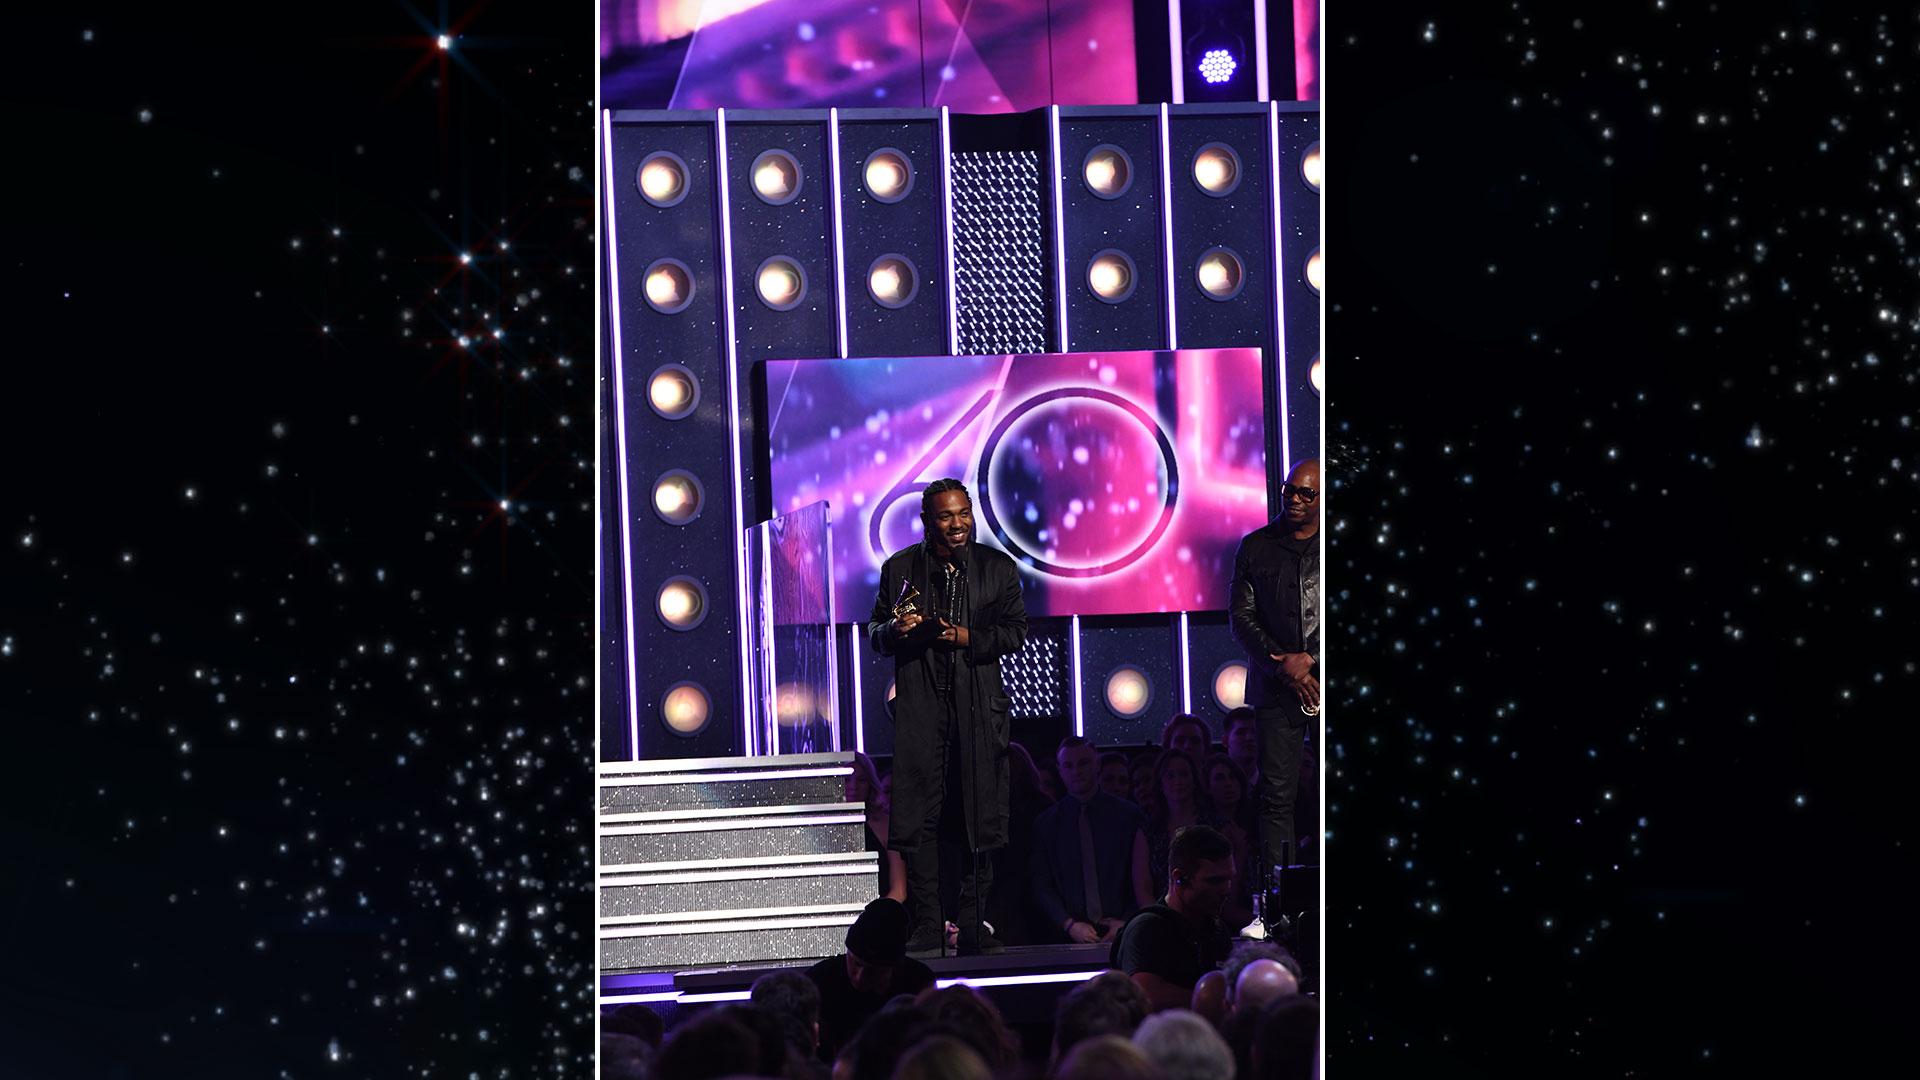 Kendrick Lamar wins Best Rap Album for DAMN. at the 60th Annual GRAMMY Awards.